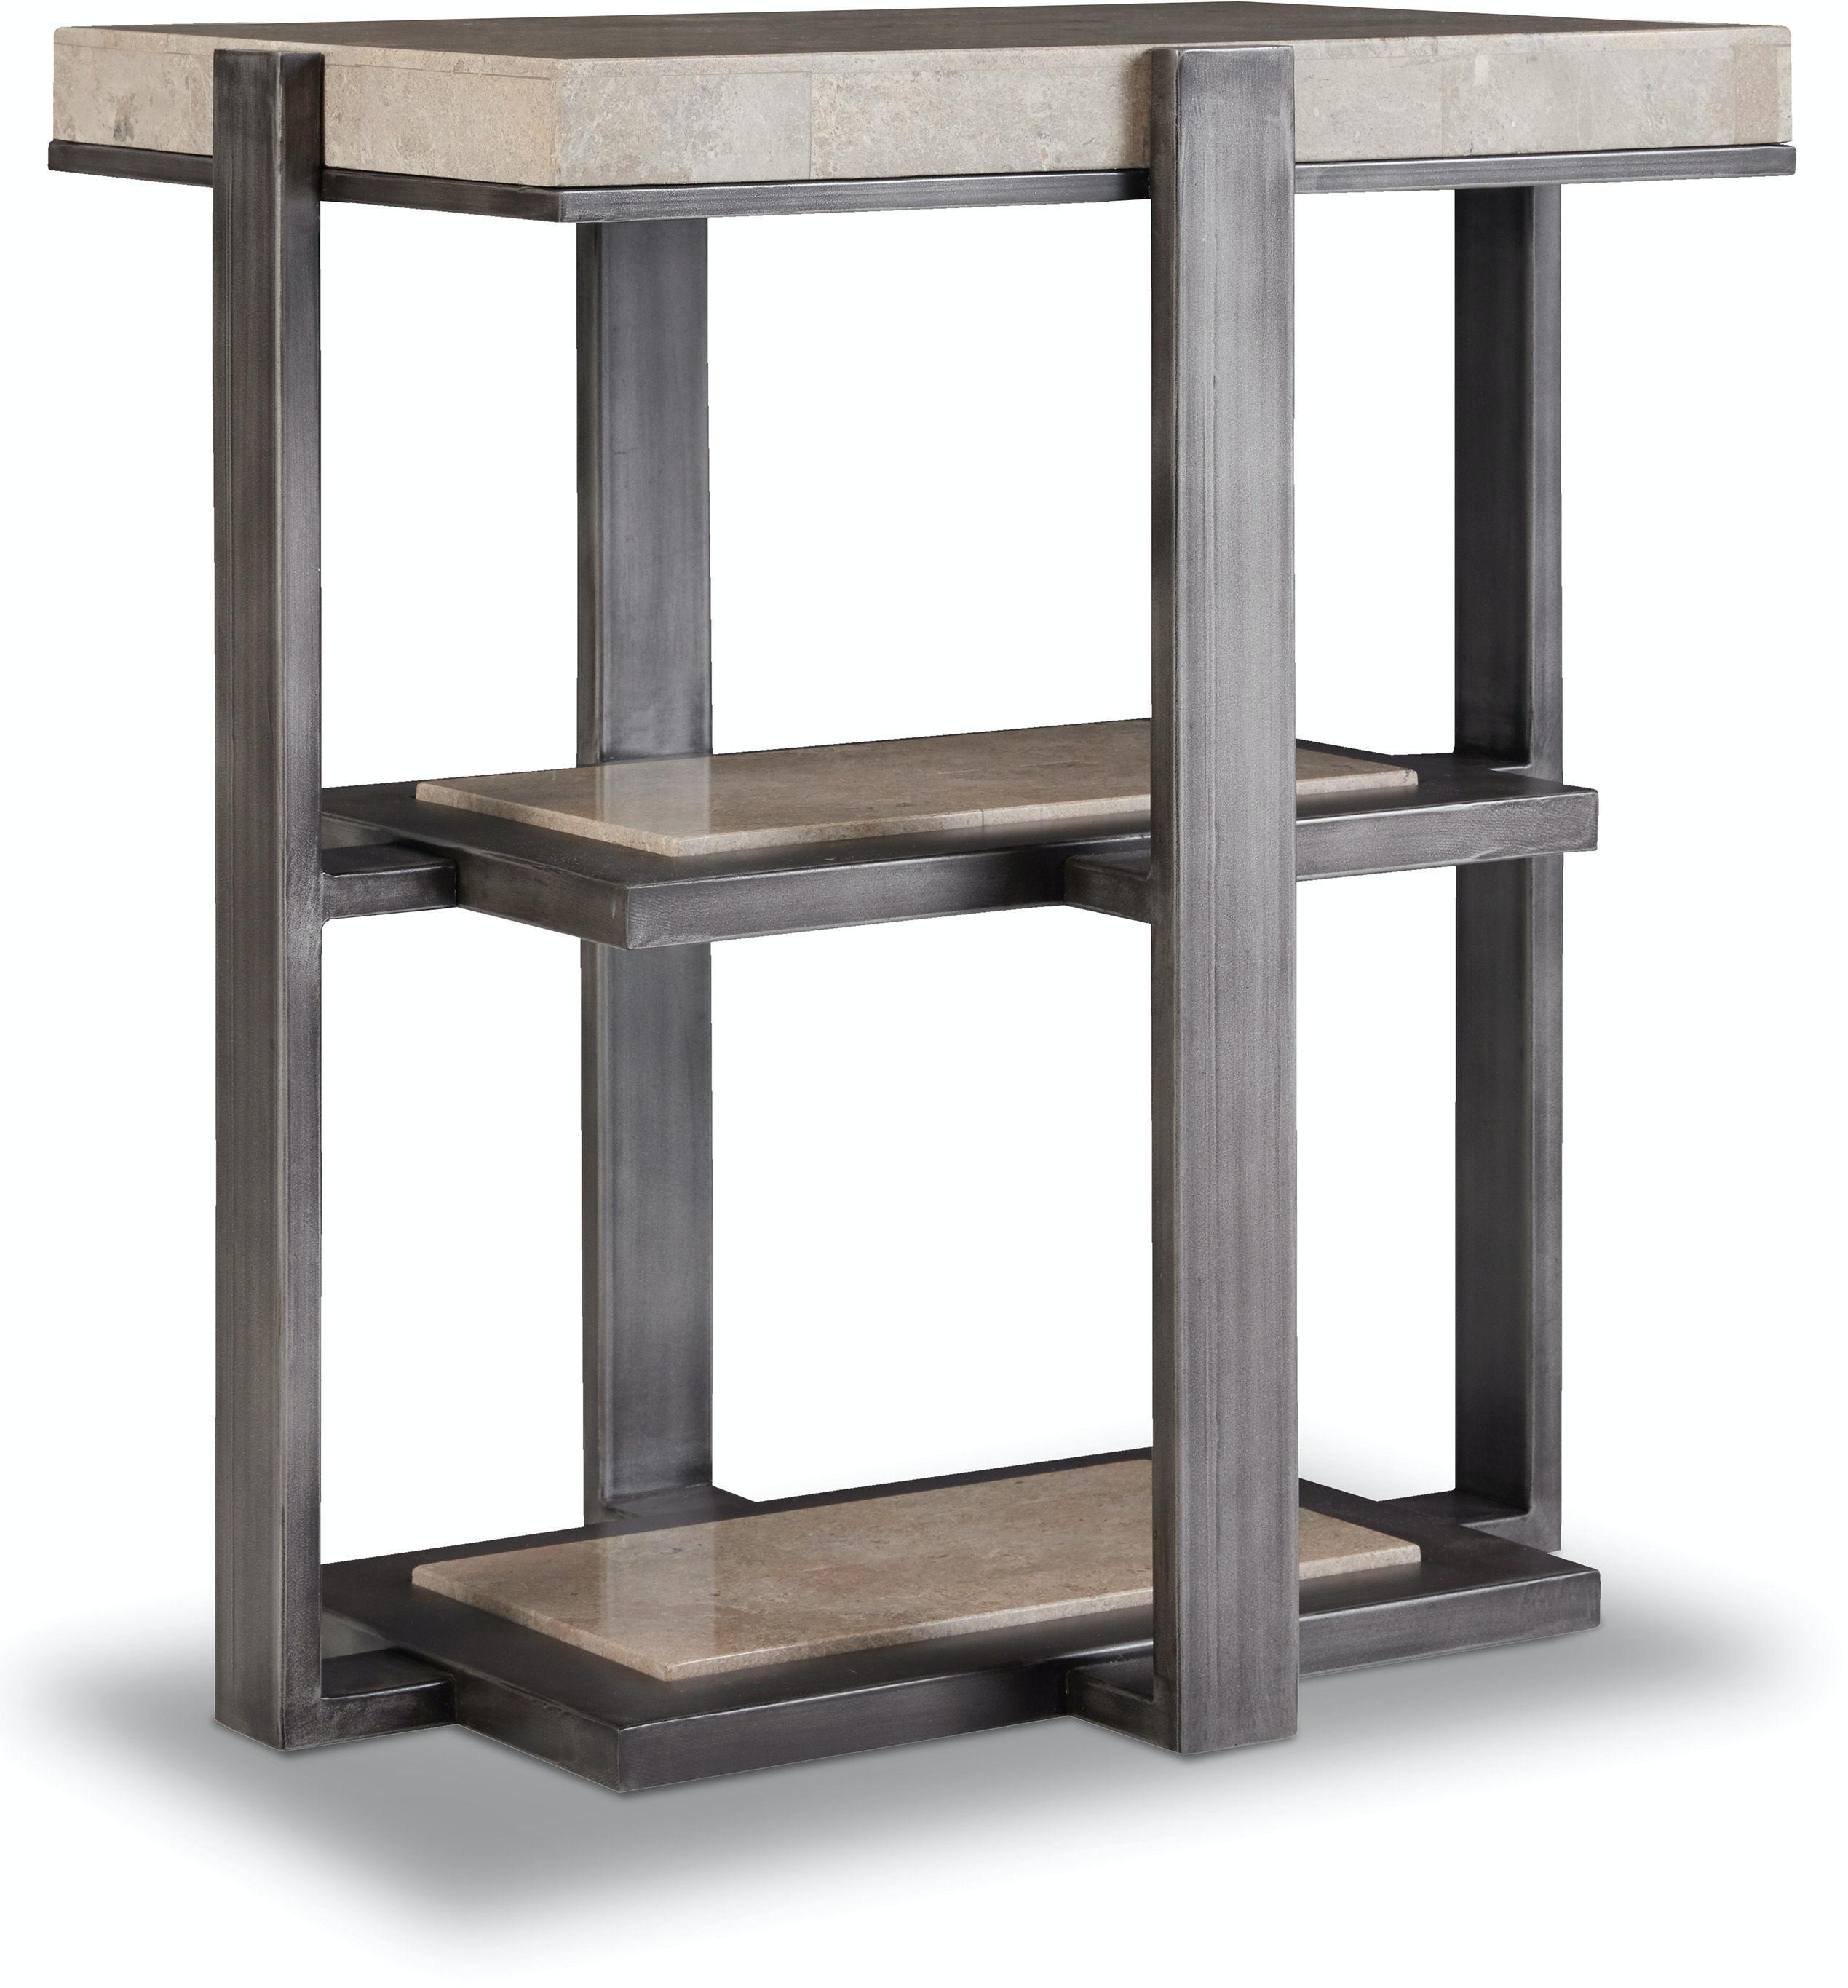 Hooker Furniture Living Room Chairside Table 5533 LTBR